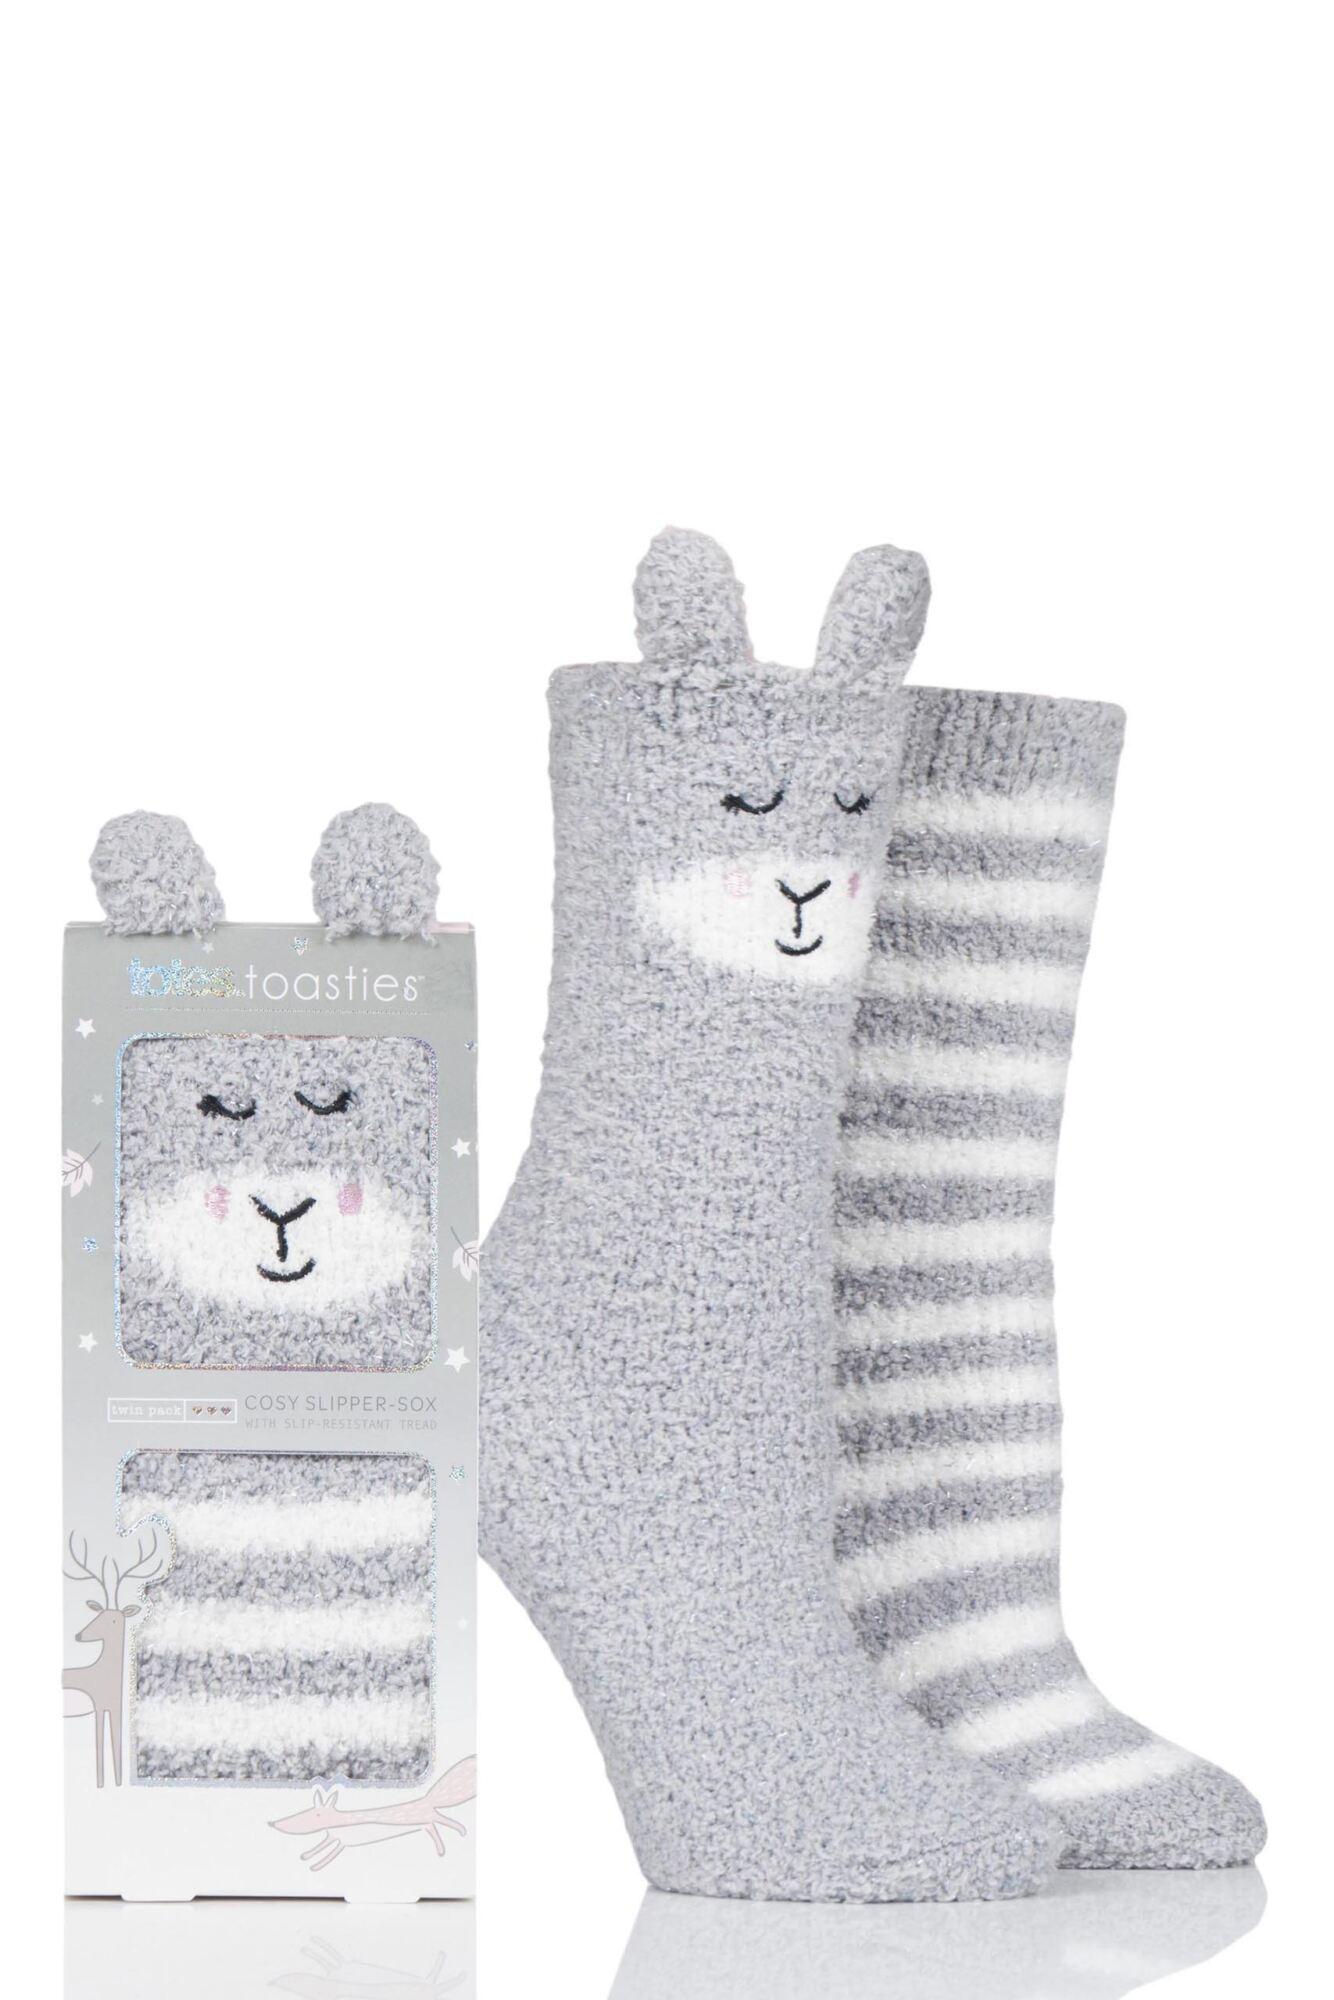 2 Pair Cosy Animal Striped Socks Ladies - Totes